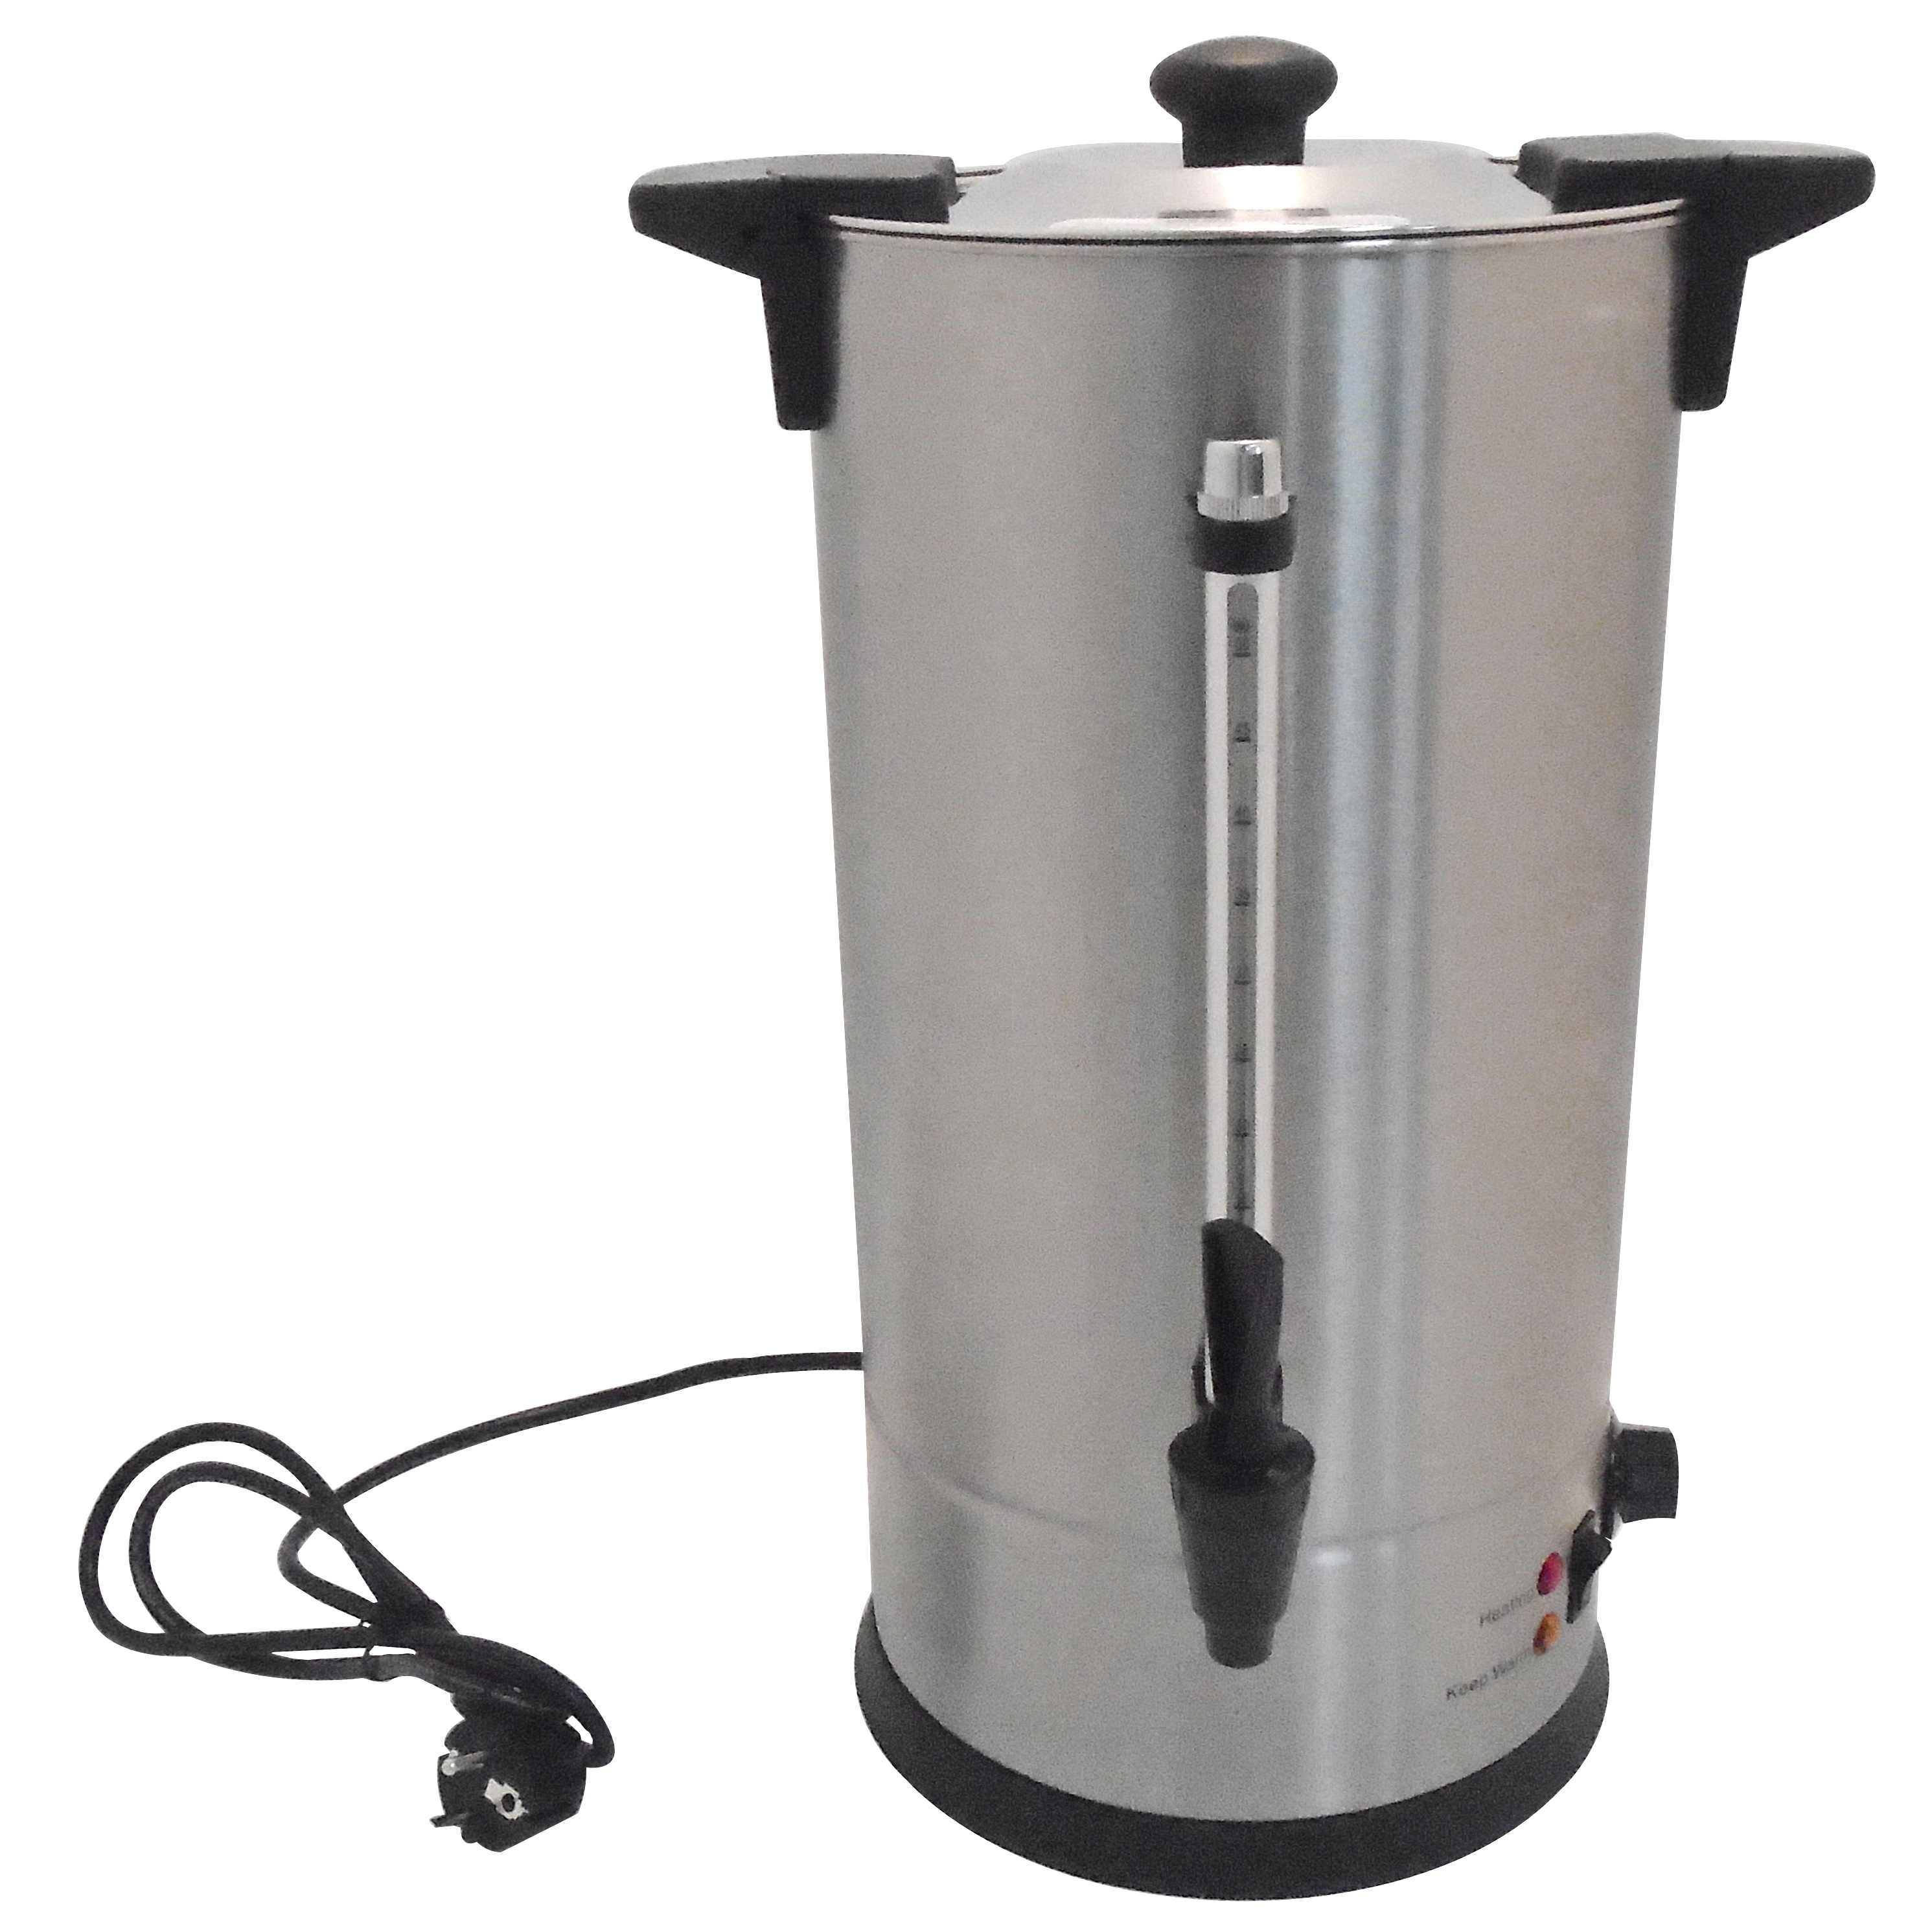 ENC-100DR Μηχανές Καφέ Φίλτρου - Βραστήρας Καφέ Φίλτρου Percolator & Βραστήρας Ν επαγγελματικός εξοπλισμός   μηχανές καφέ   συσκευές για bar   percolator   βραστ